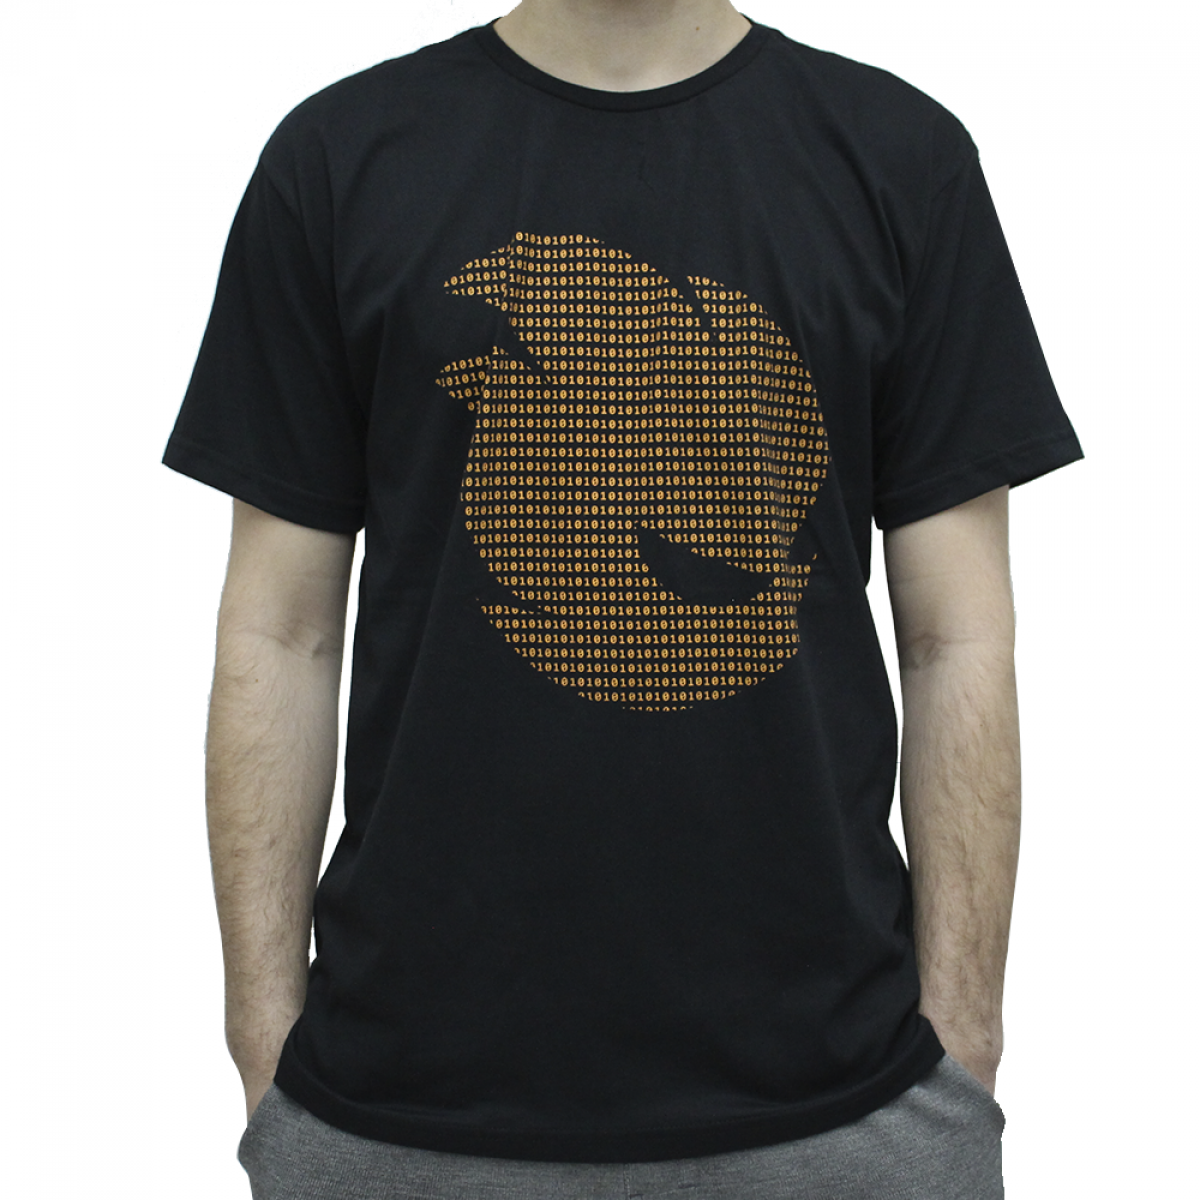 Camiseta Terabyteshop, Unisex, Manga Curta, Algodão, Preto e Laranja, Logo (GG)